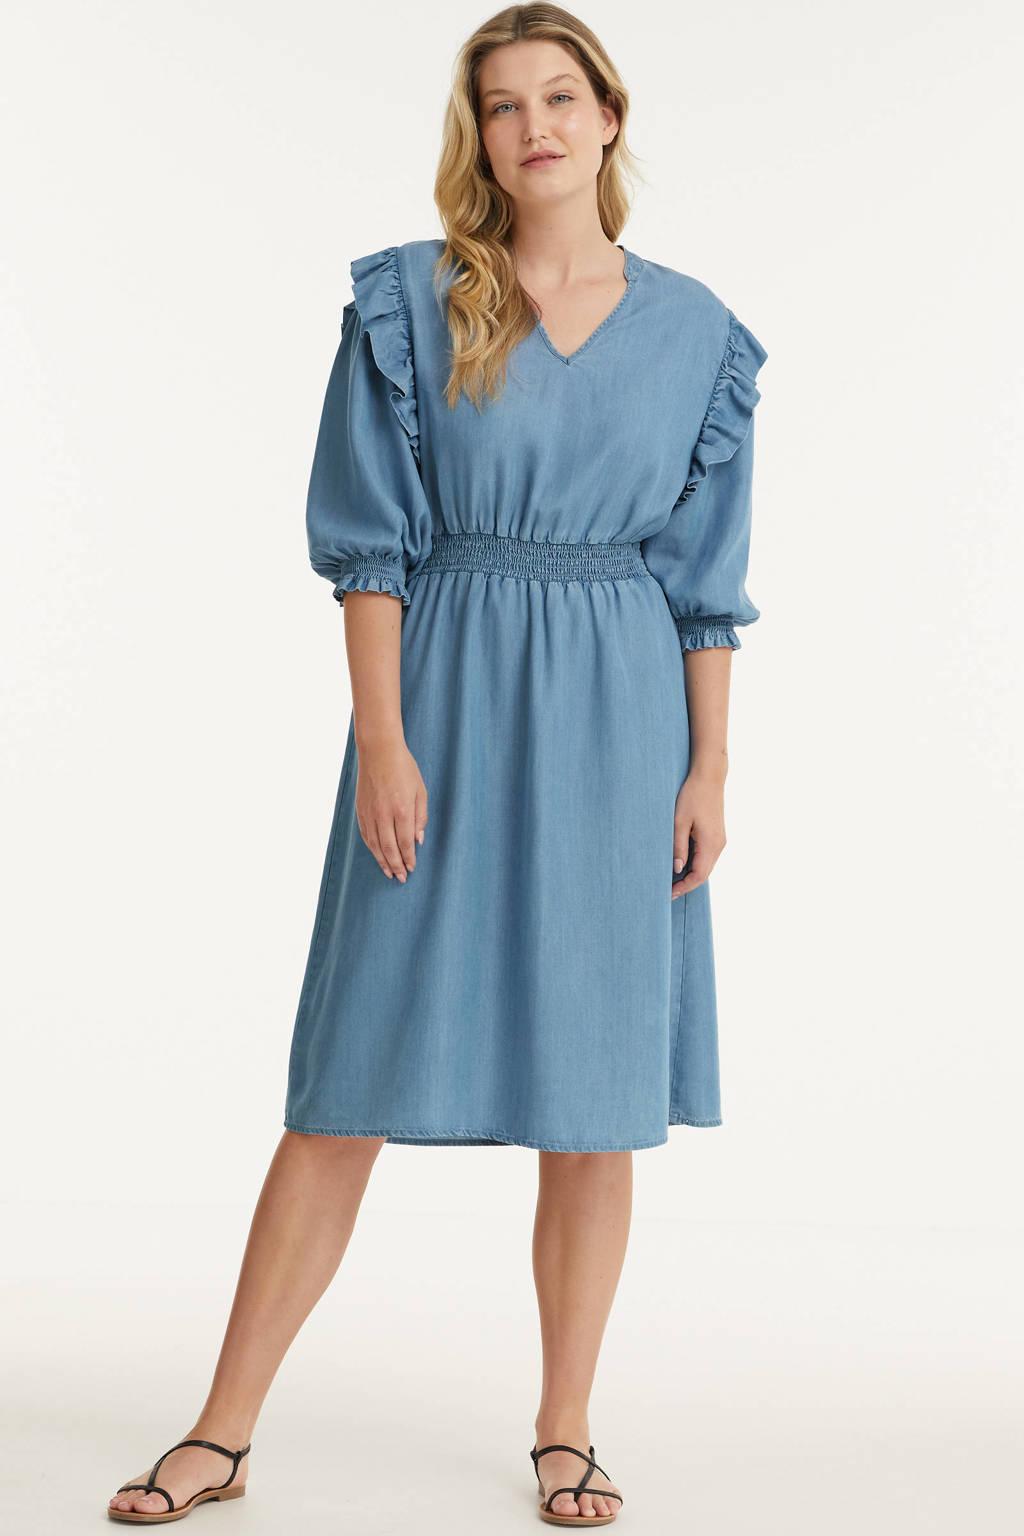 Miljuschka by Wehkamp tencel jurk met ruches blauw, Blauw